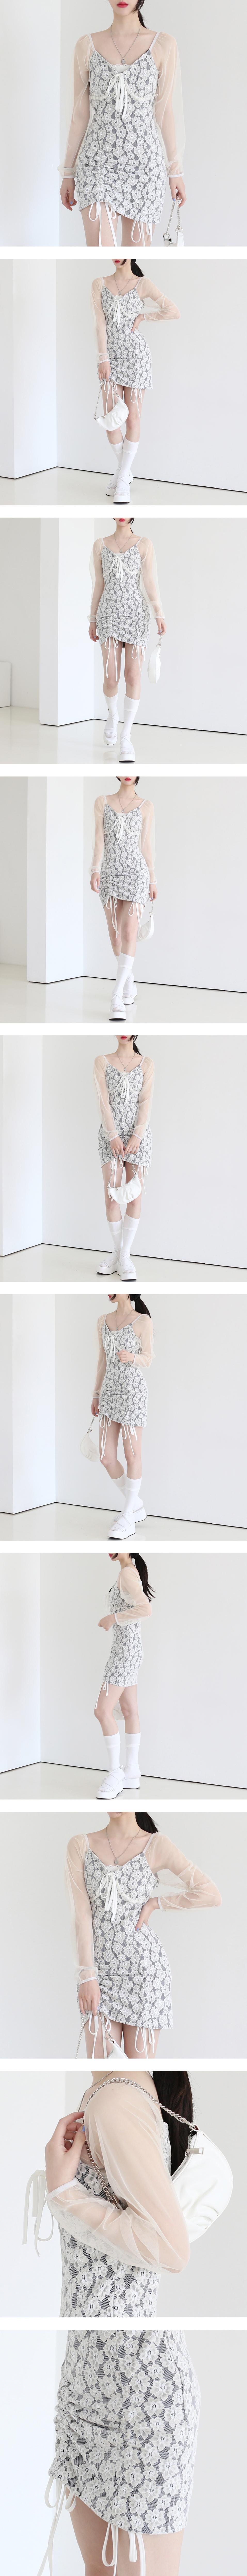 Mulley See-Through Flower Dress